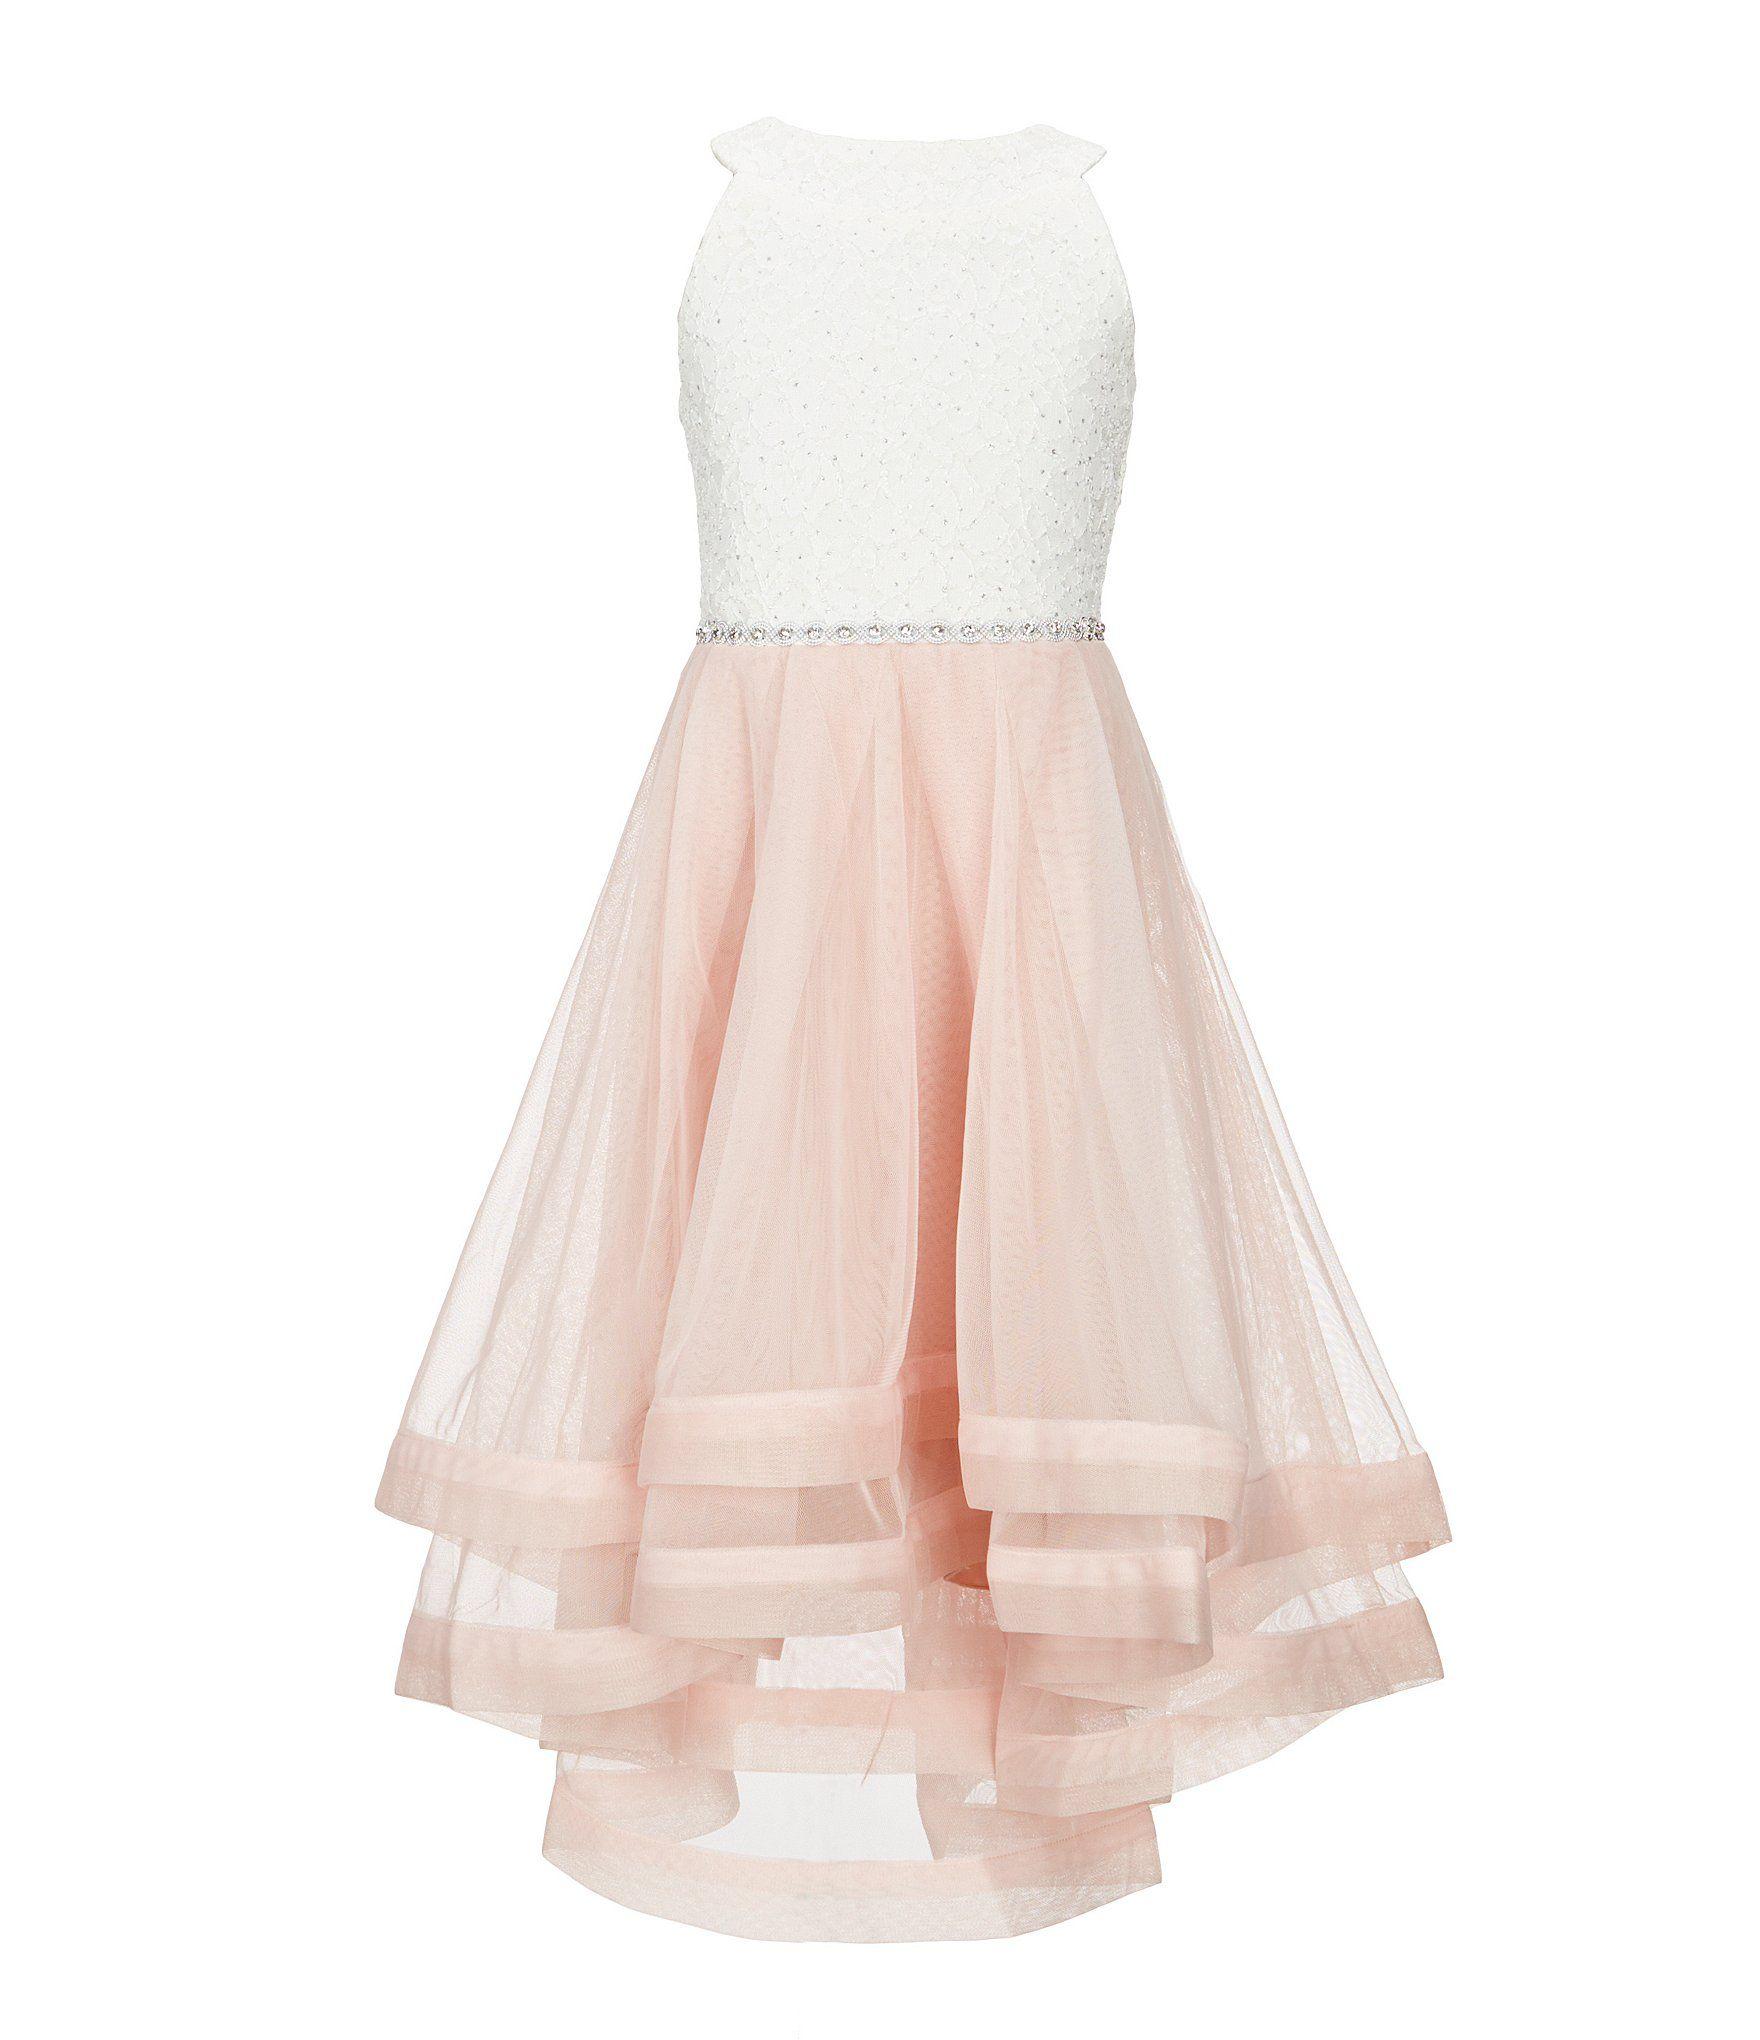 9cb4a83f7d3d Shop for Xtraordinary Big Girls 7-16 Embellished-Waist Horsehair-Hem Dress  at Dillards.com. Visit Dillards.com to find clothing